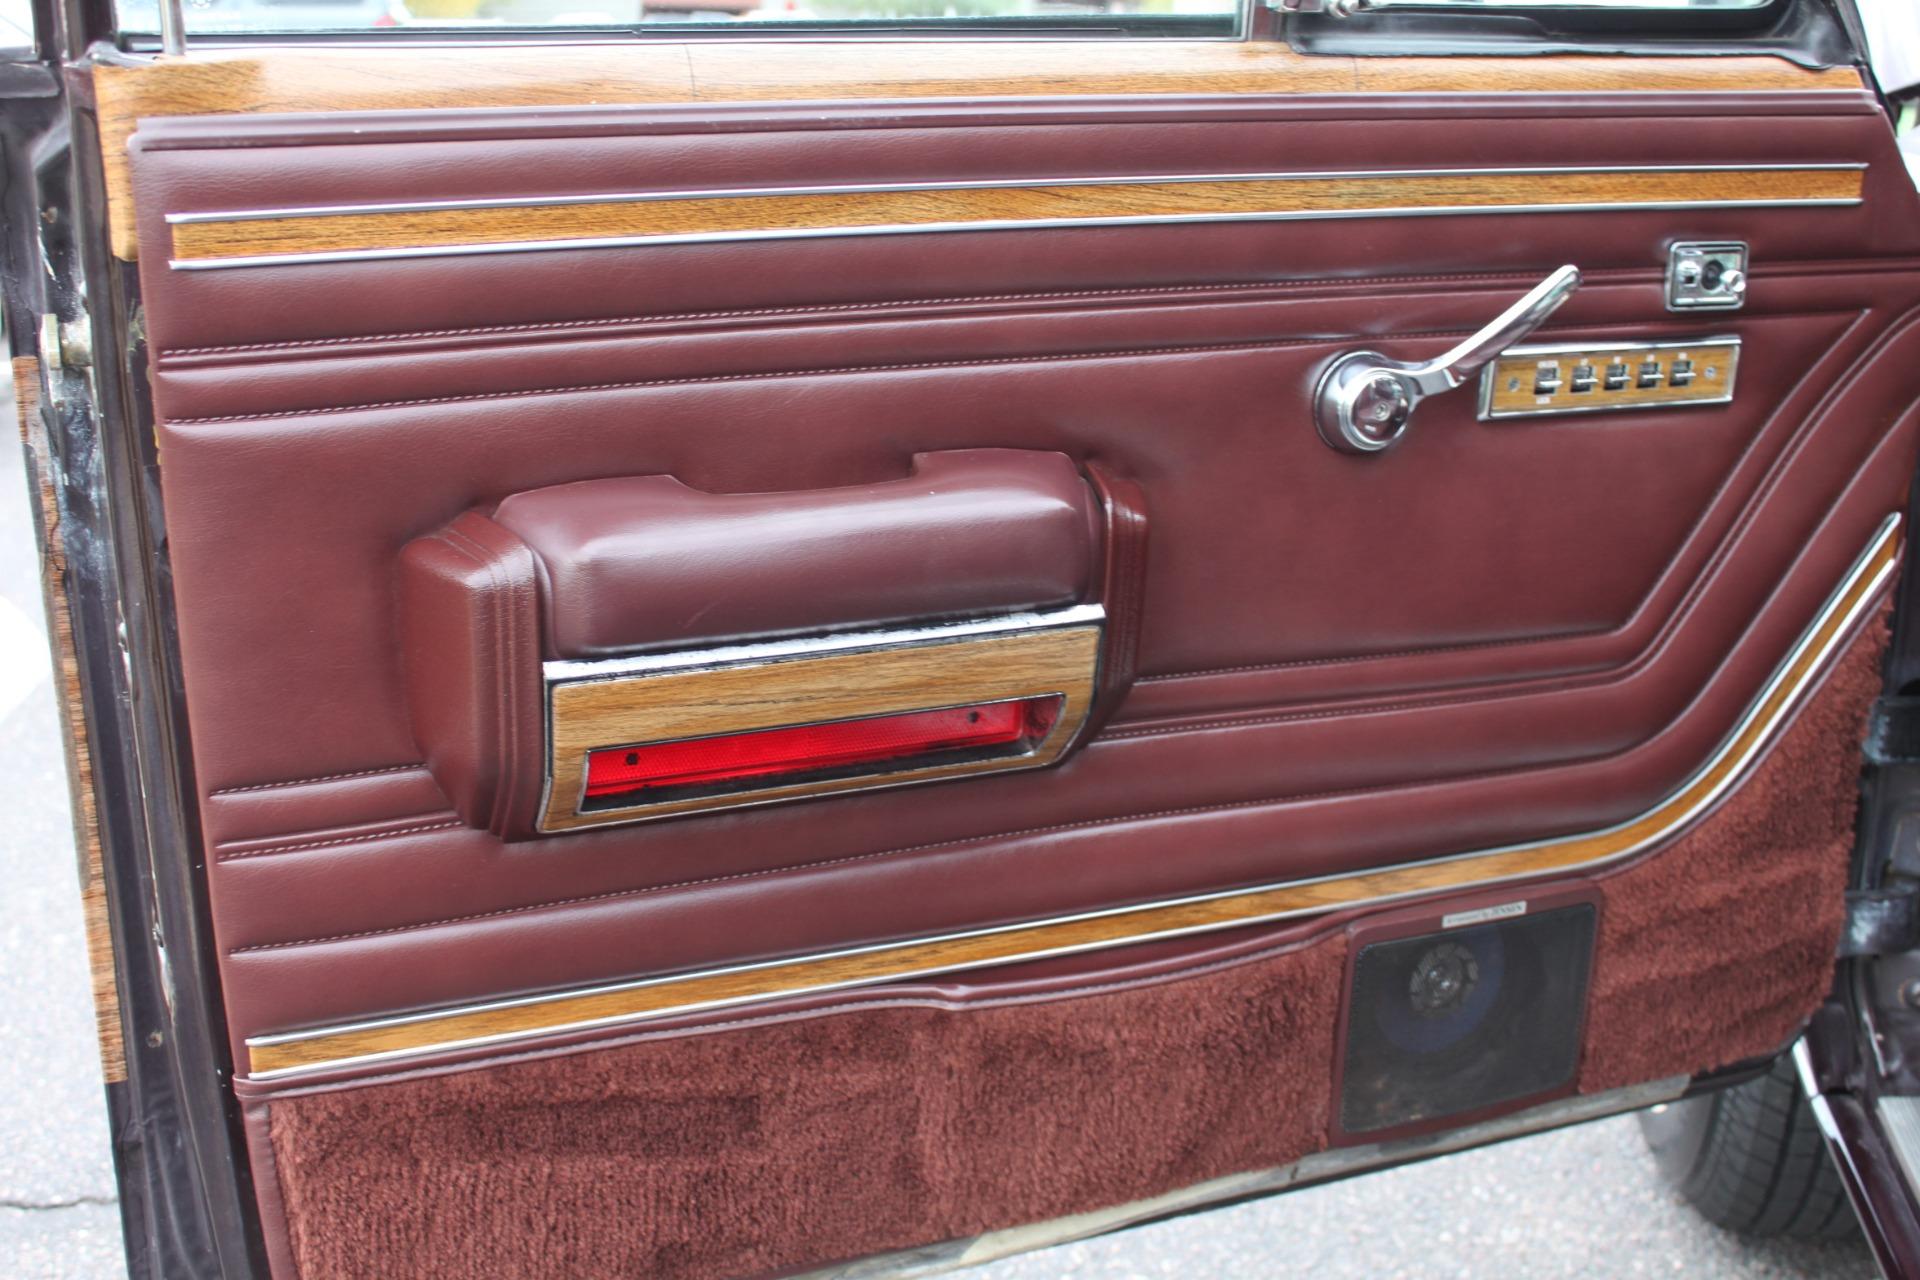 Used-1989-Jeep-Grand-Wagoneer-Ford